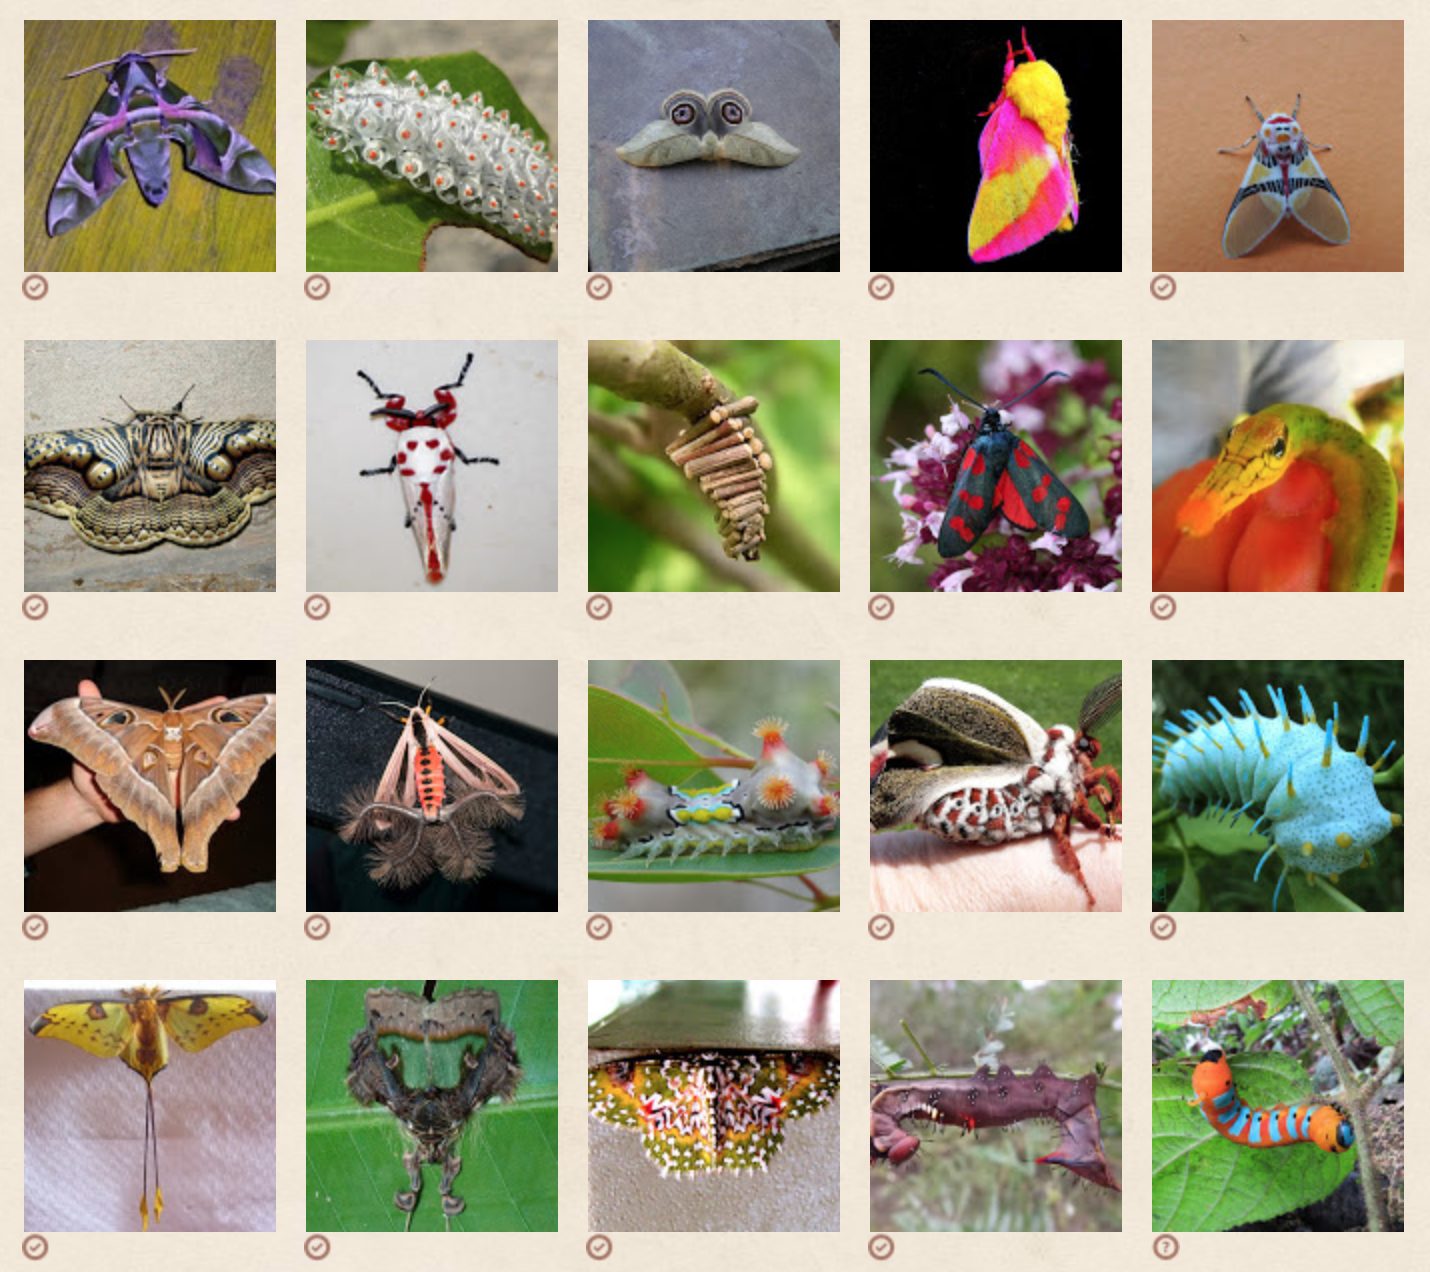 Citizen Science Platform for Wildlife | Project Noah